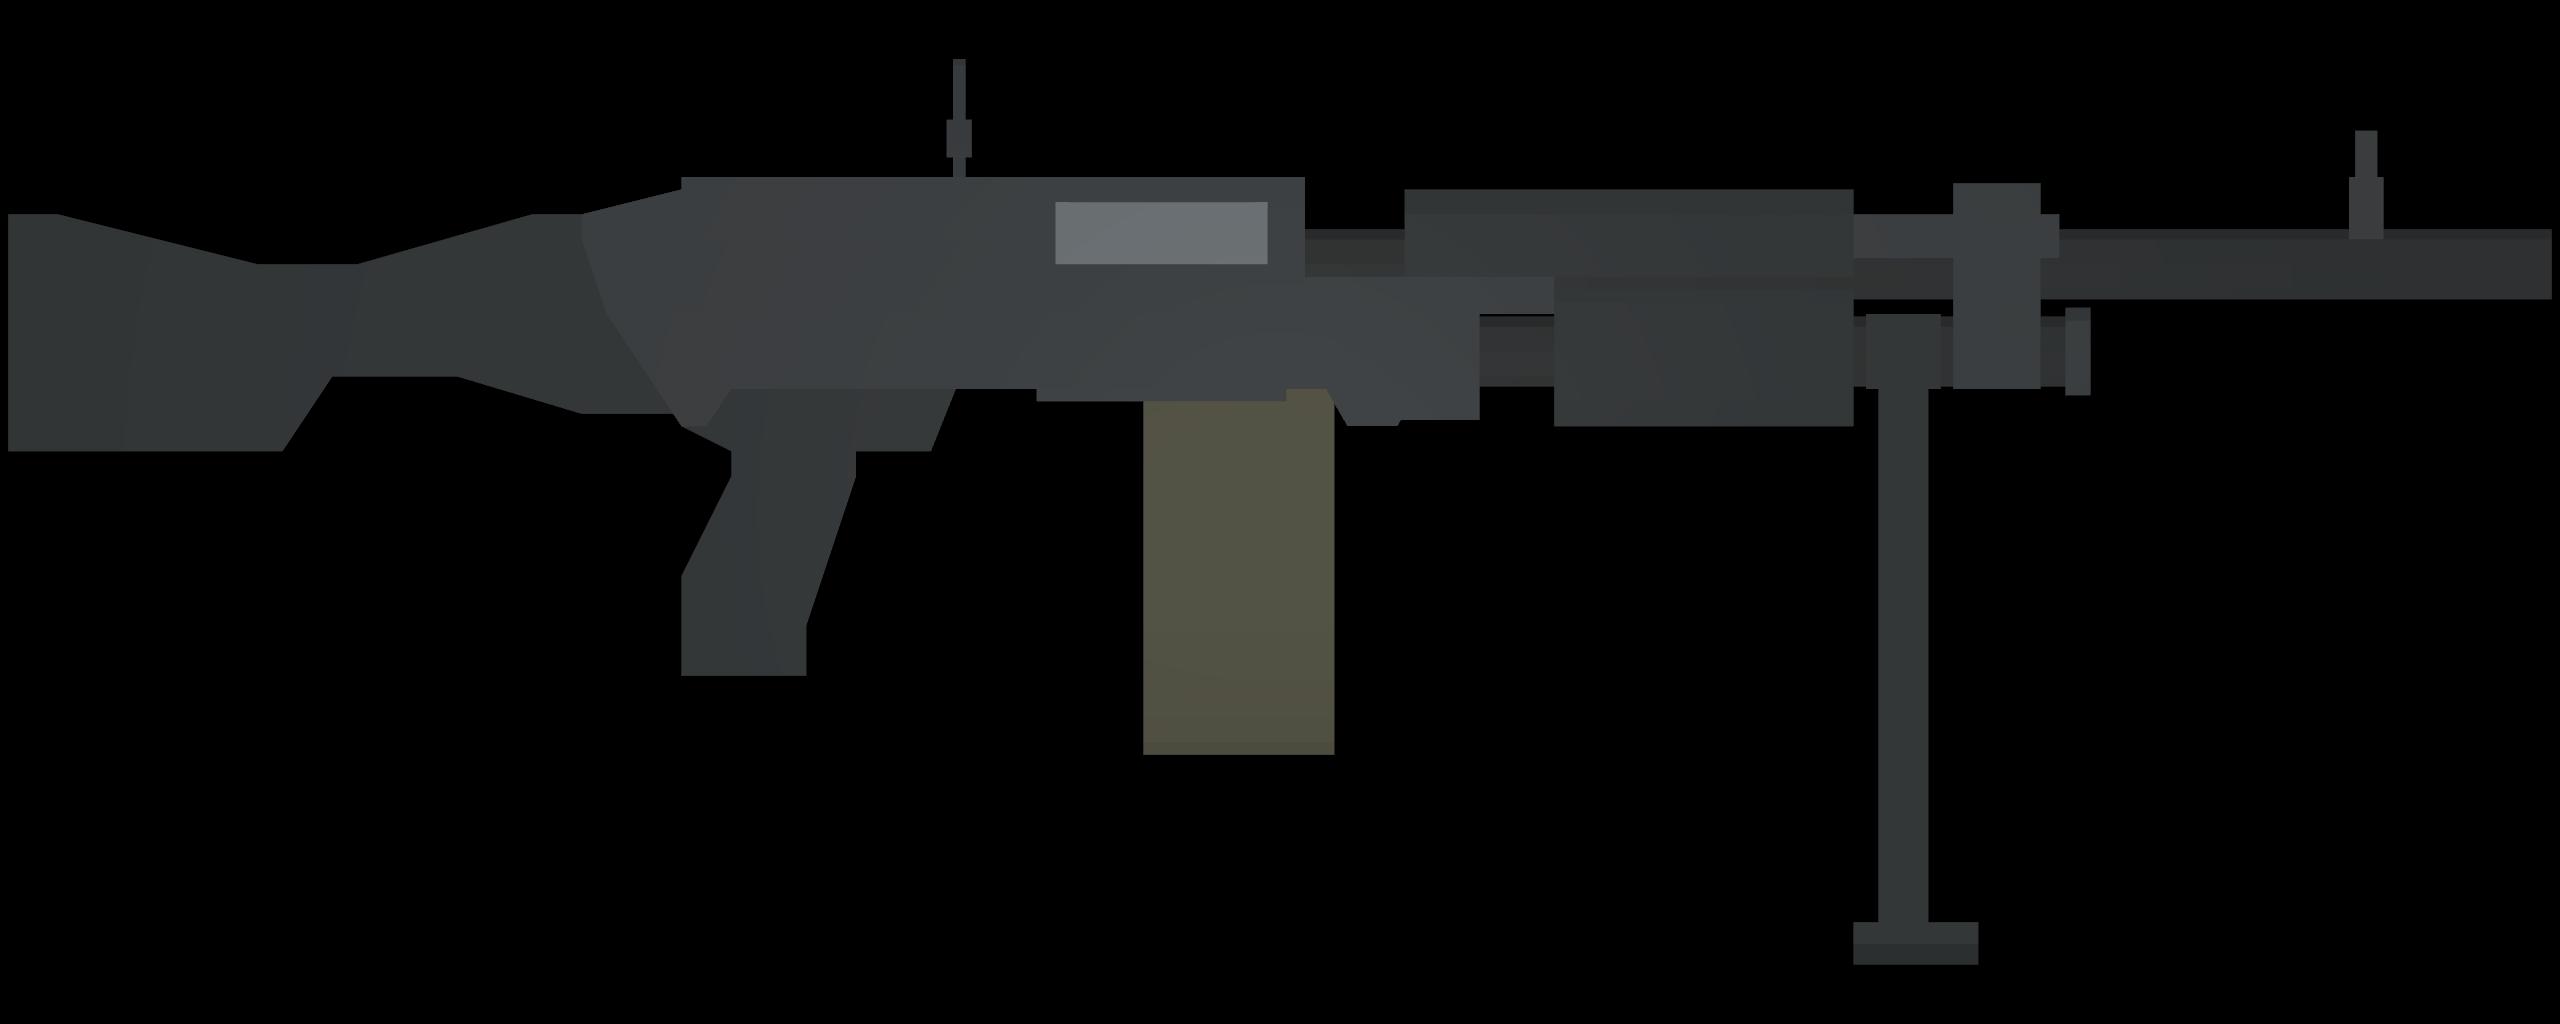 Unturned Uncreated Warfare Mods & All ID List + Attachments - USA Weapons - 8EC470E